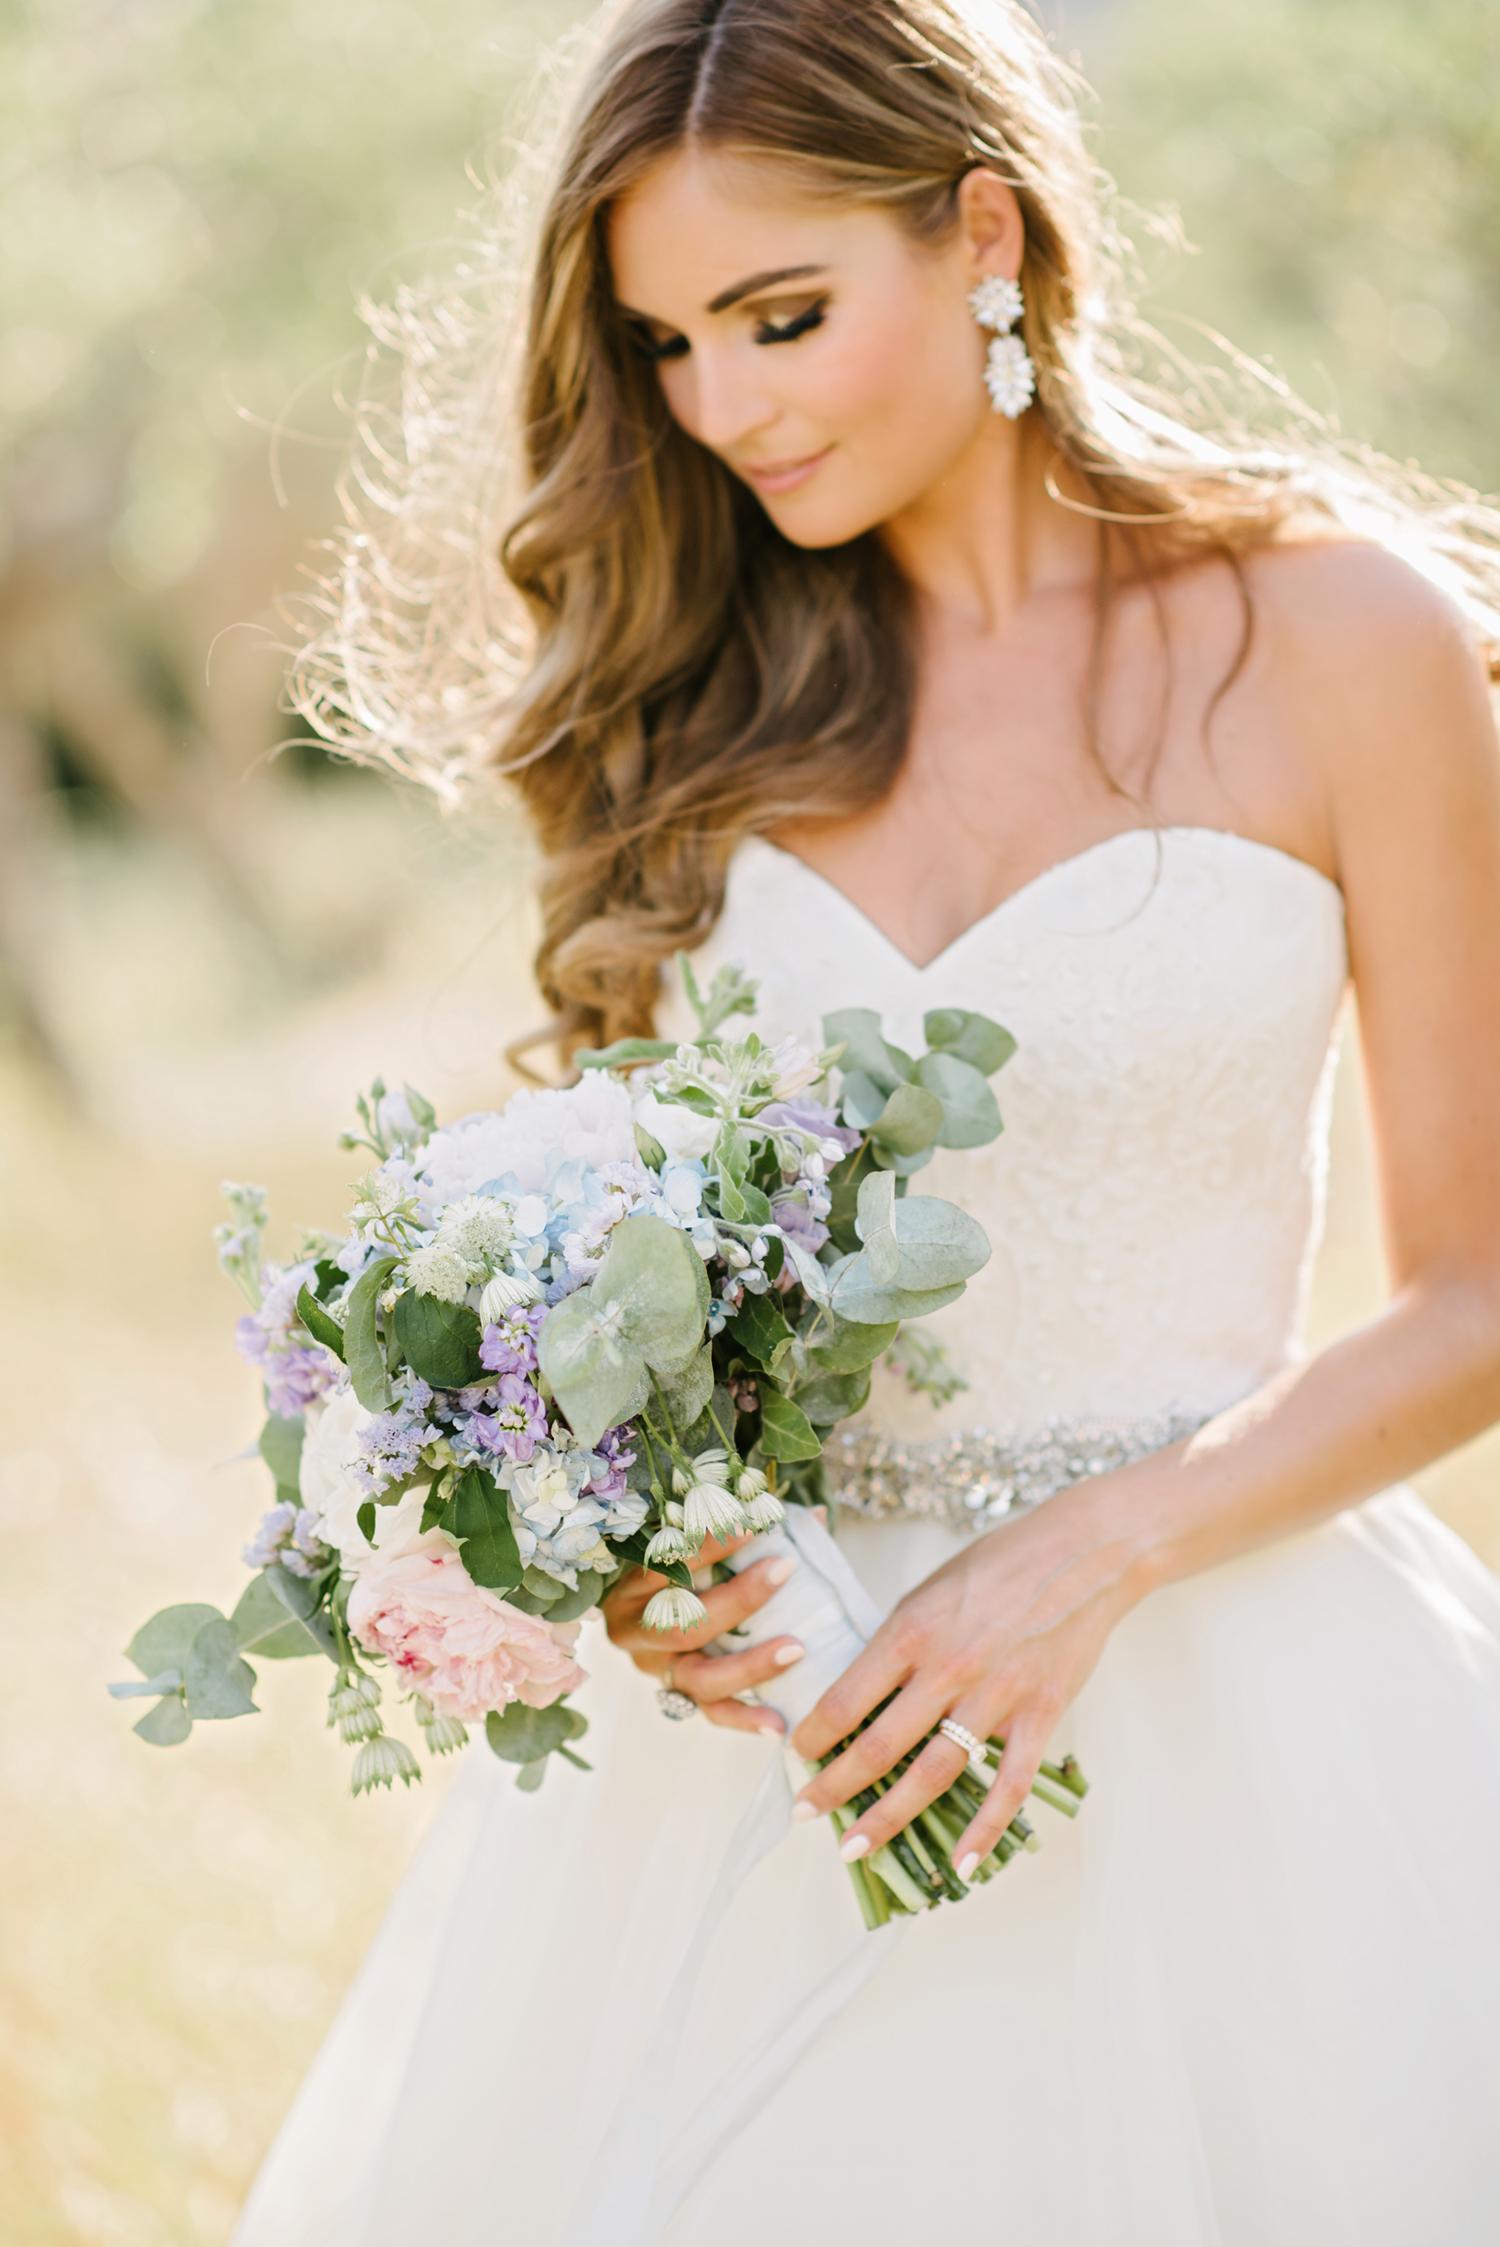 Chateau-Robernier-Wedding-Photographer-0135.jpg